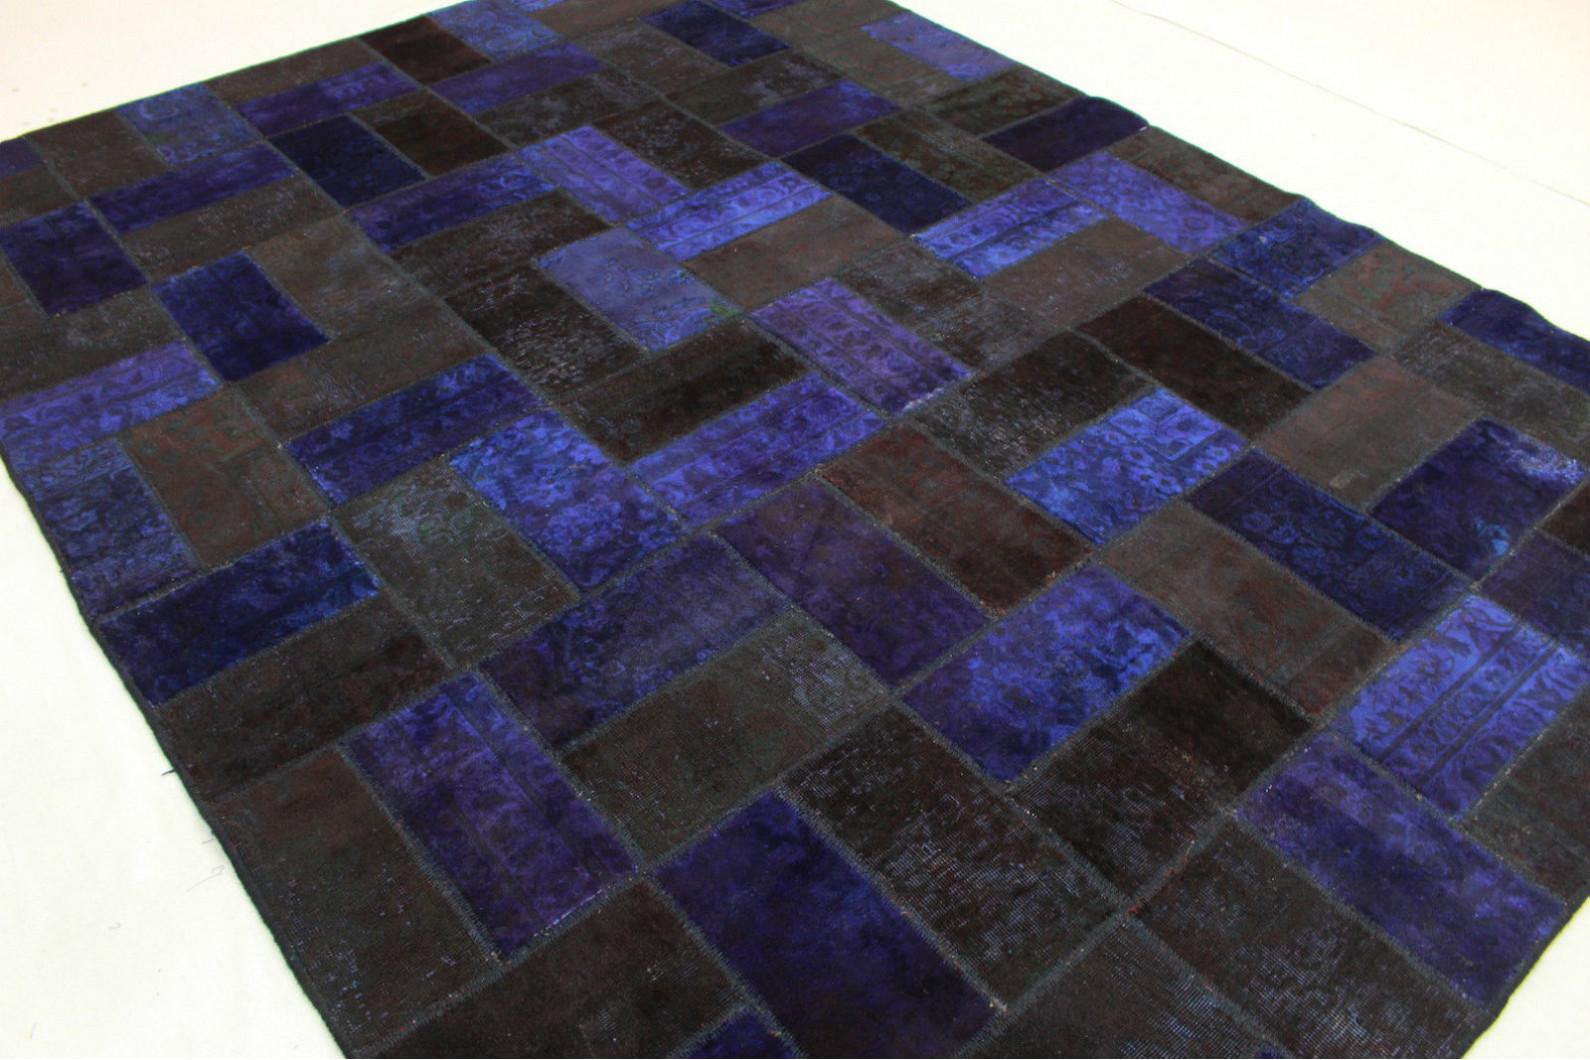 patchwork teppich lila in 320x240cm 1001 1679 bei. Black Bedroom Furniture Sets. Home Design Ideas